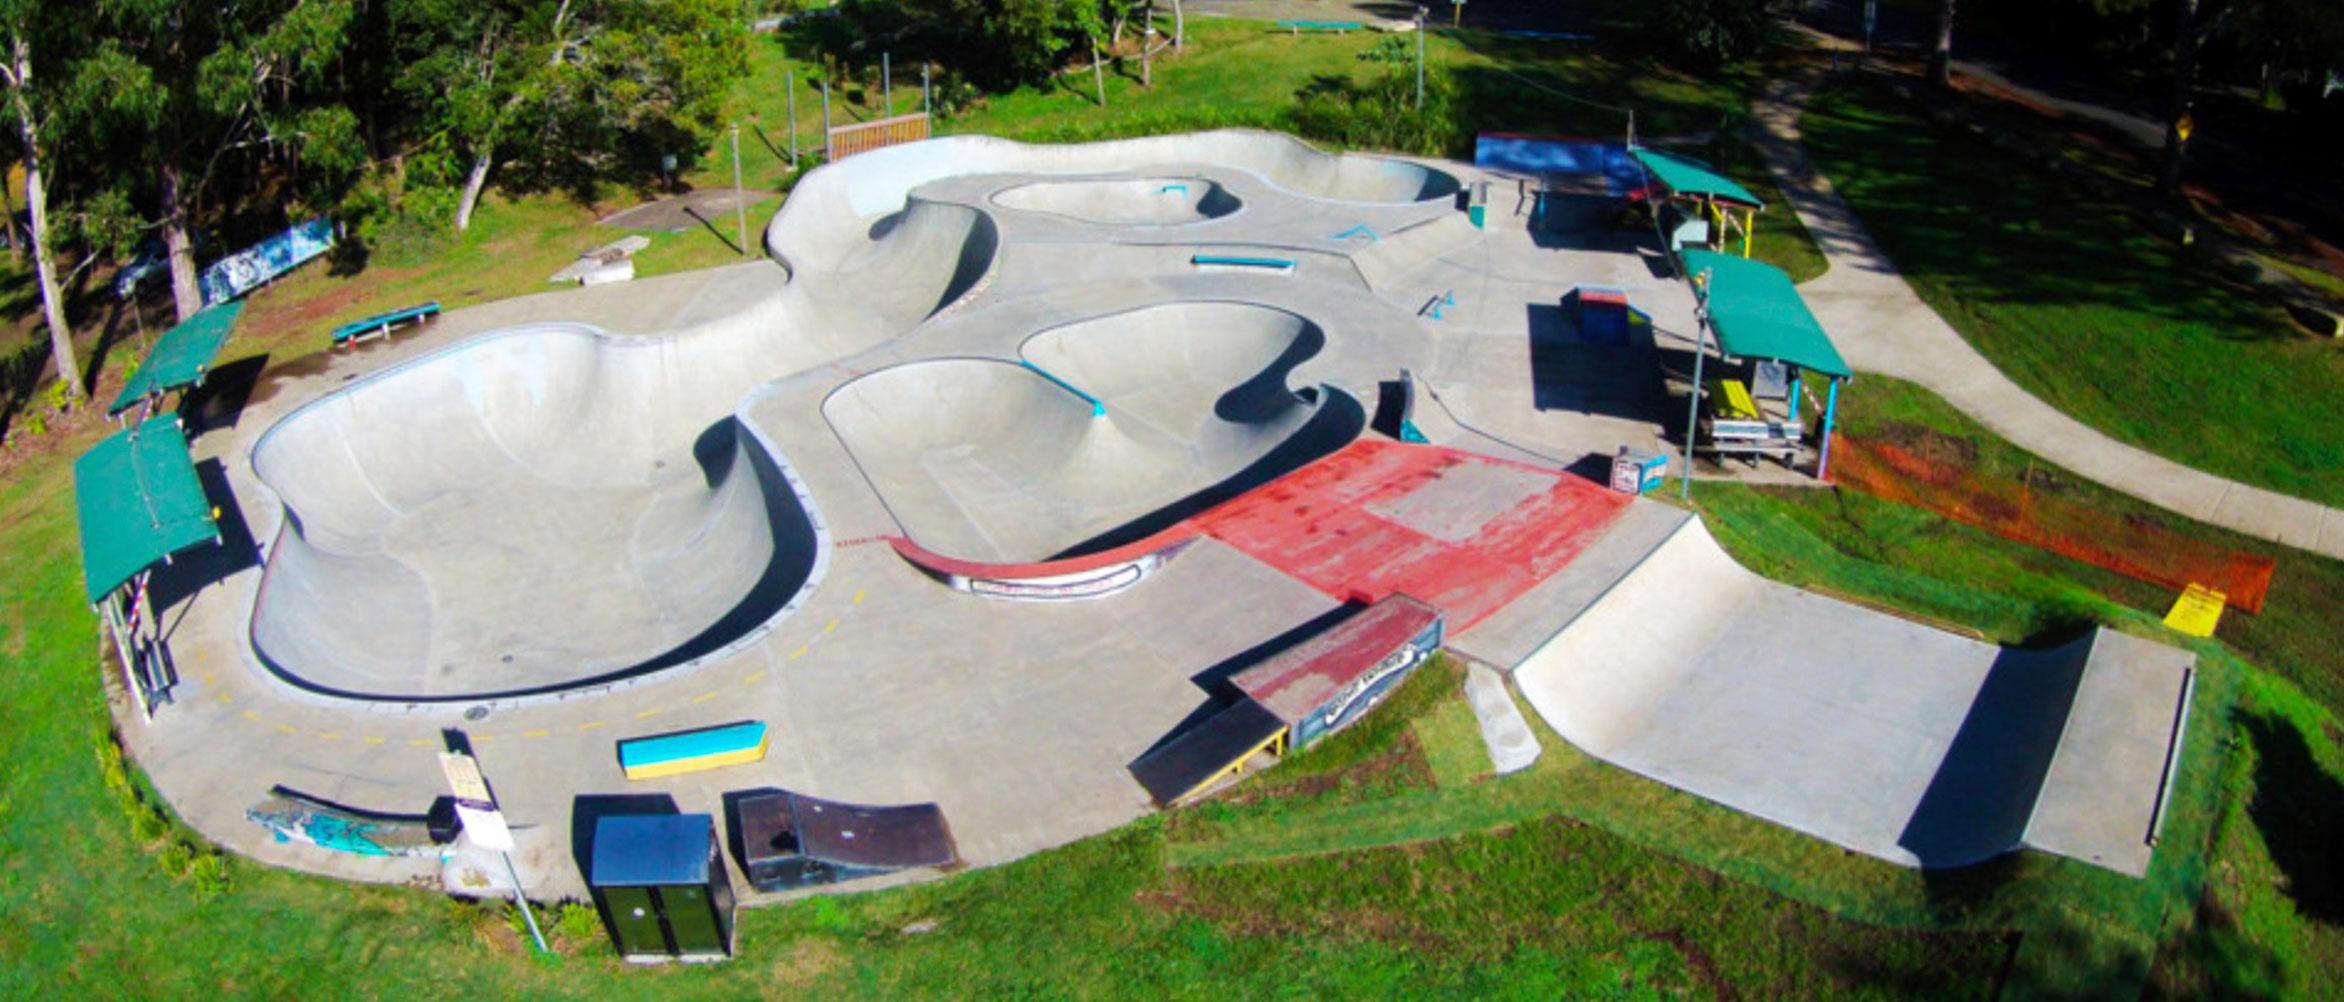 Nimbin skate park drone shot